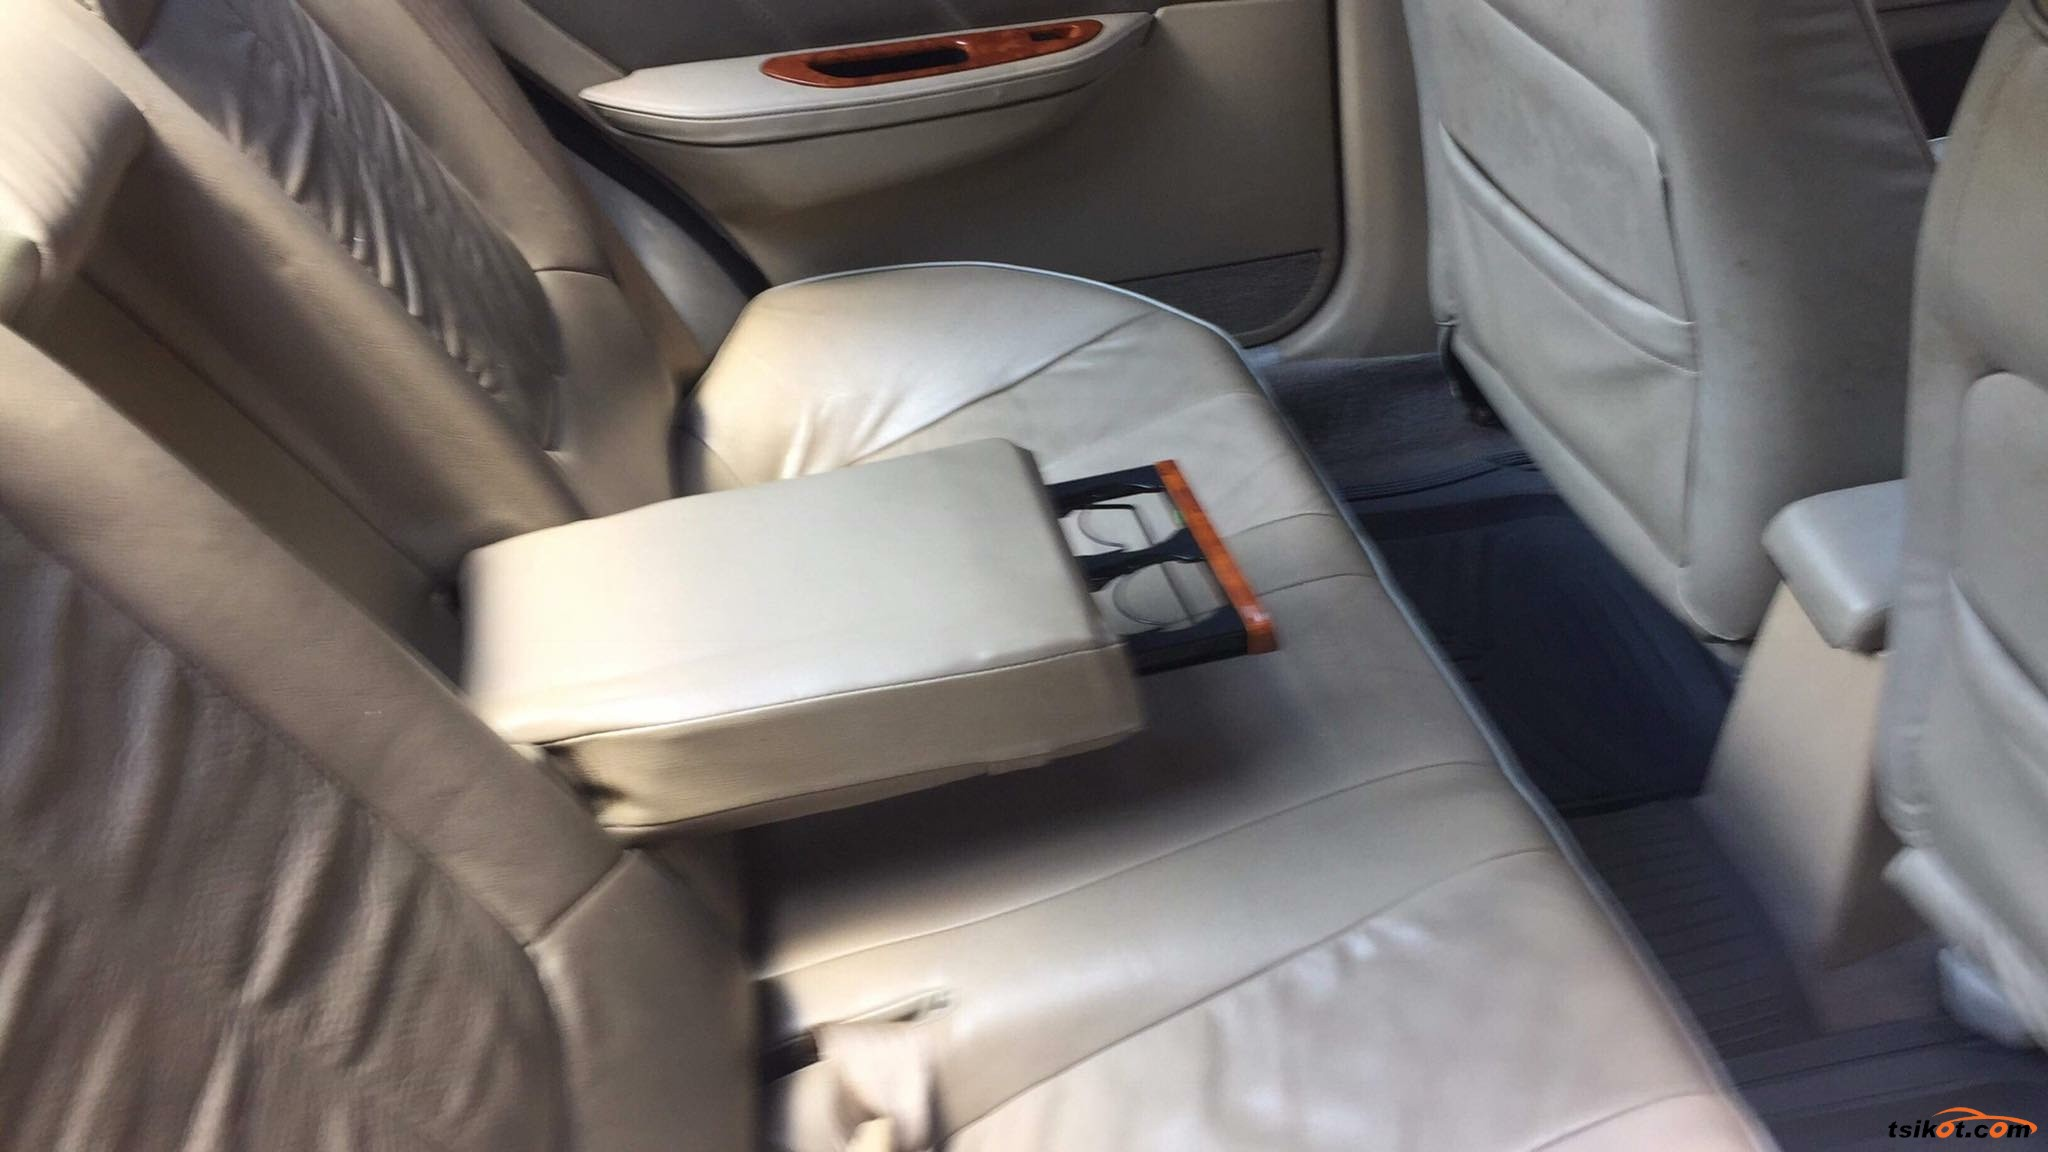 Nissan Sentra 2001 - 1